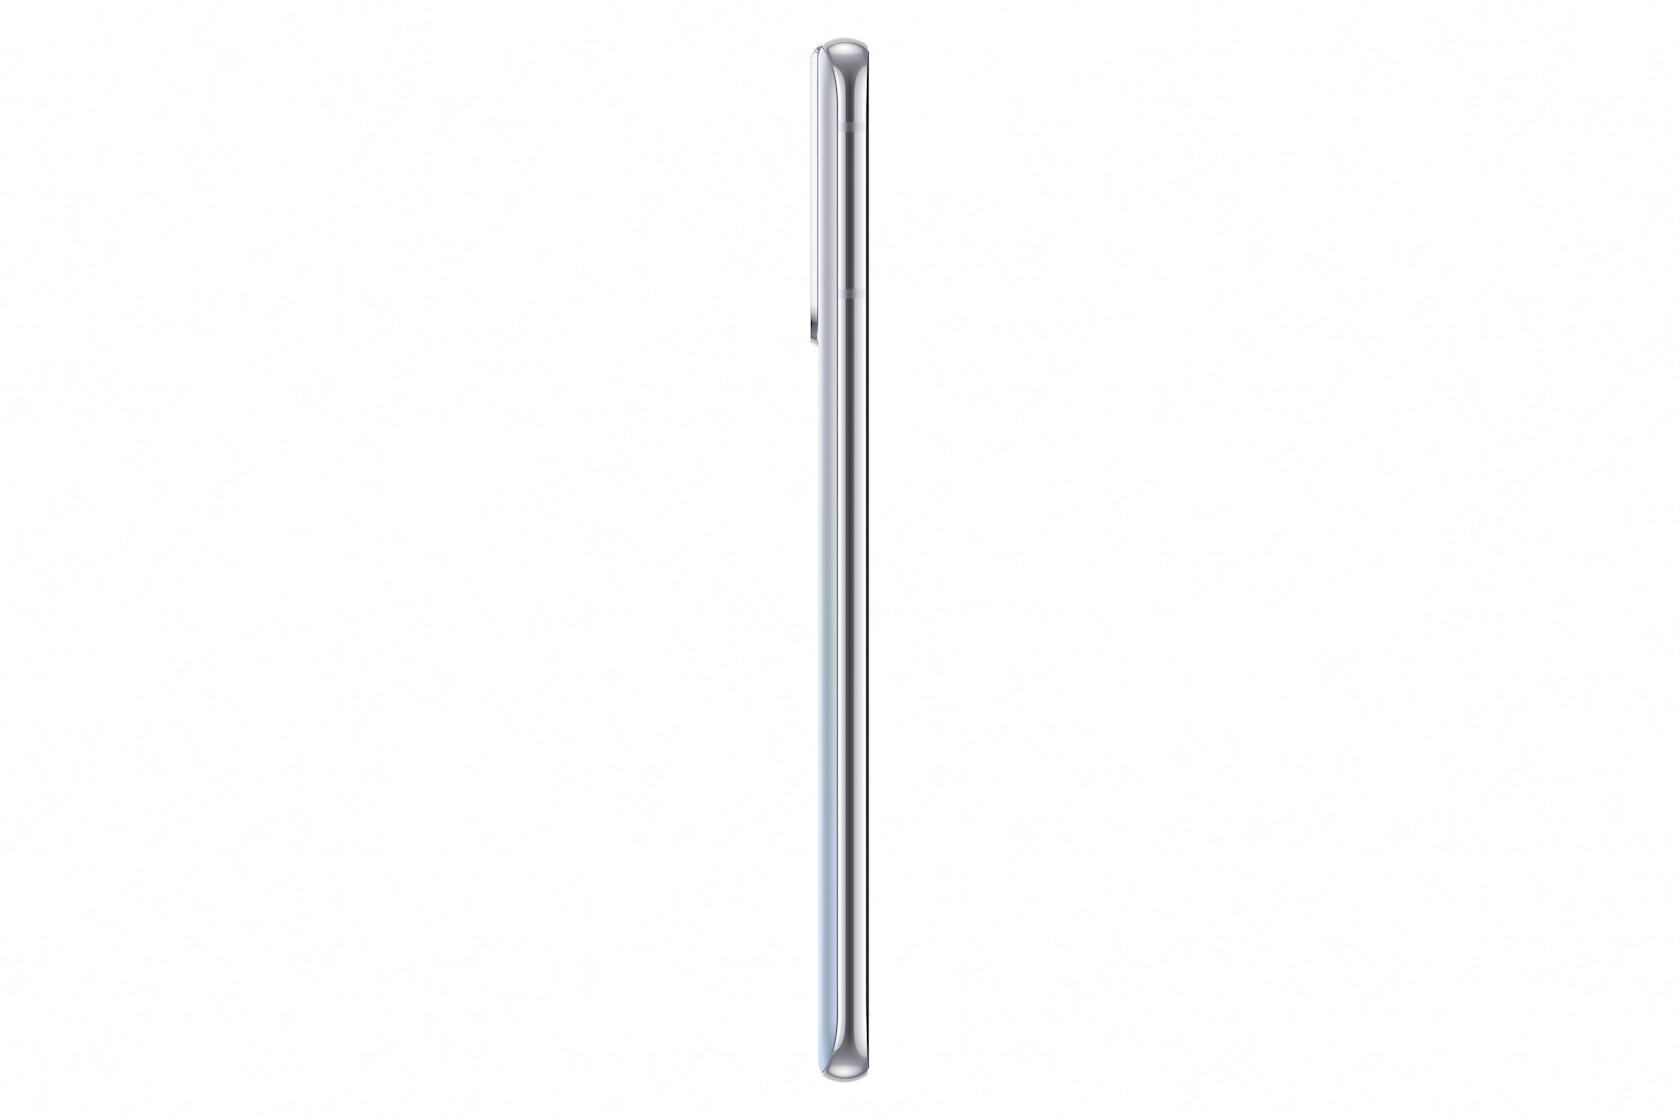 Smartfon Samsung Galaxy S20 Plus 8GB/128GB Silver